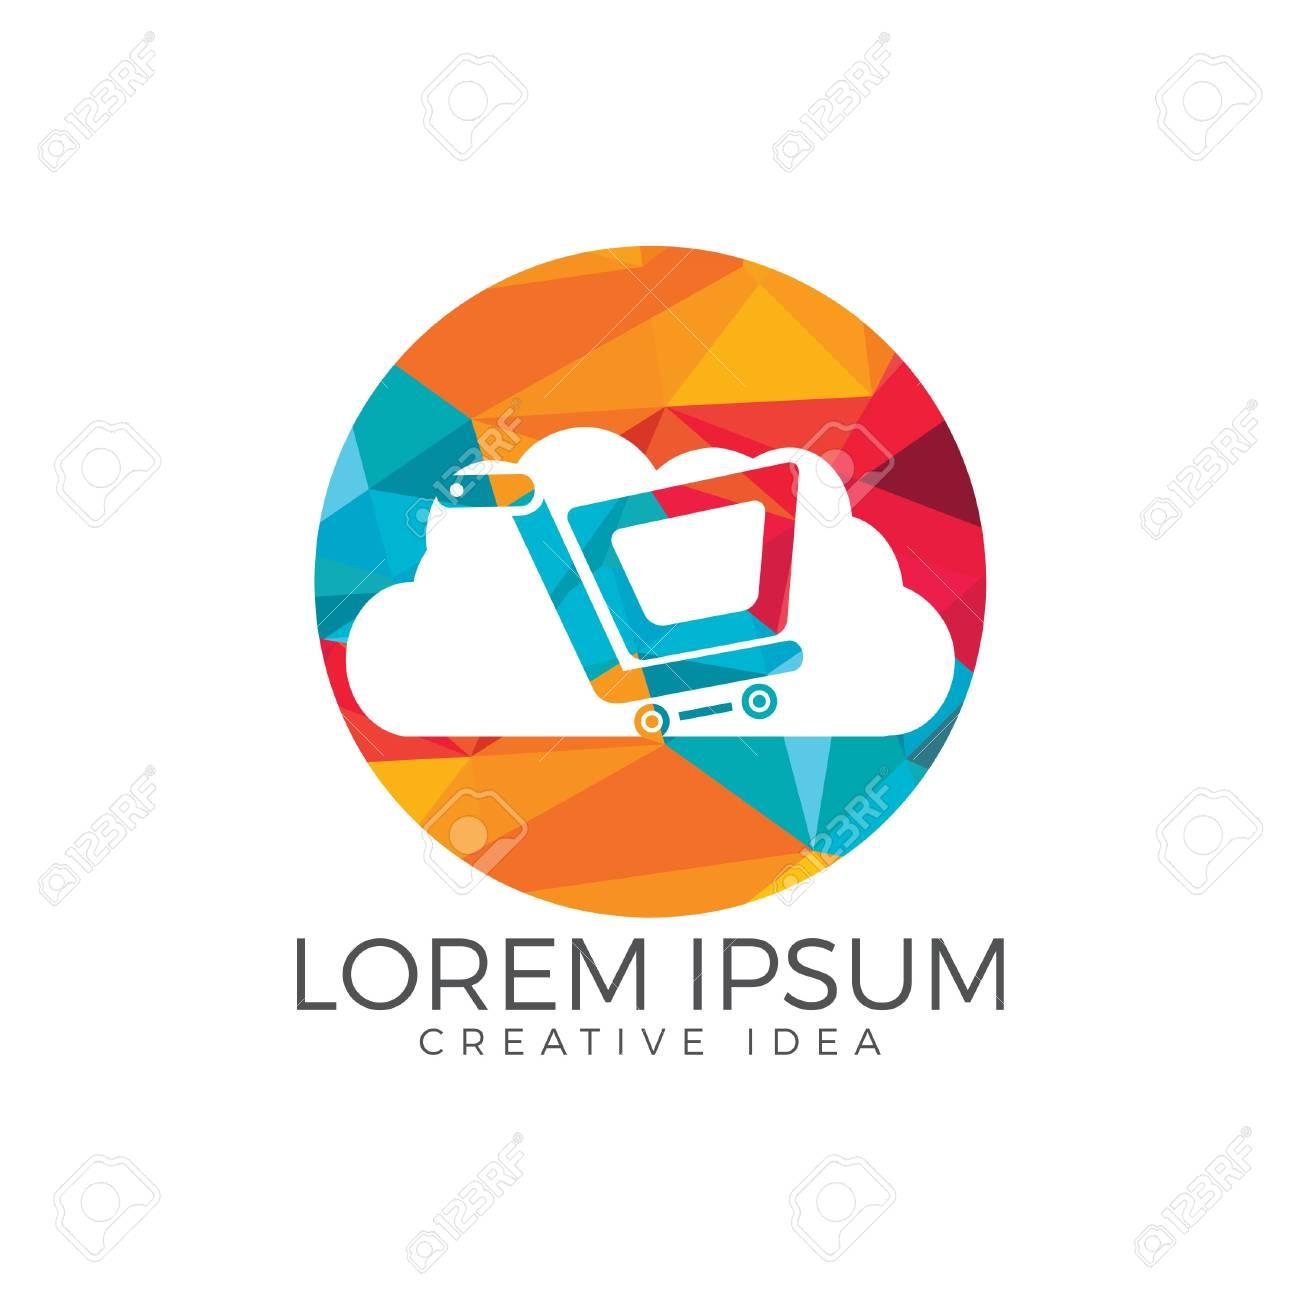 Cloud Shoping Logo Design Vector Online Shop Logo Template Royalty